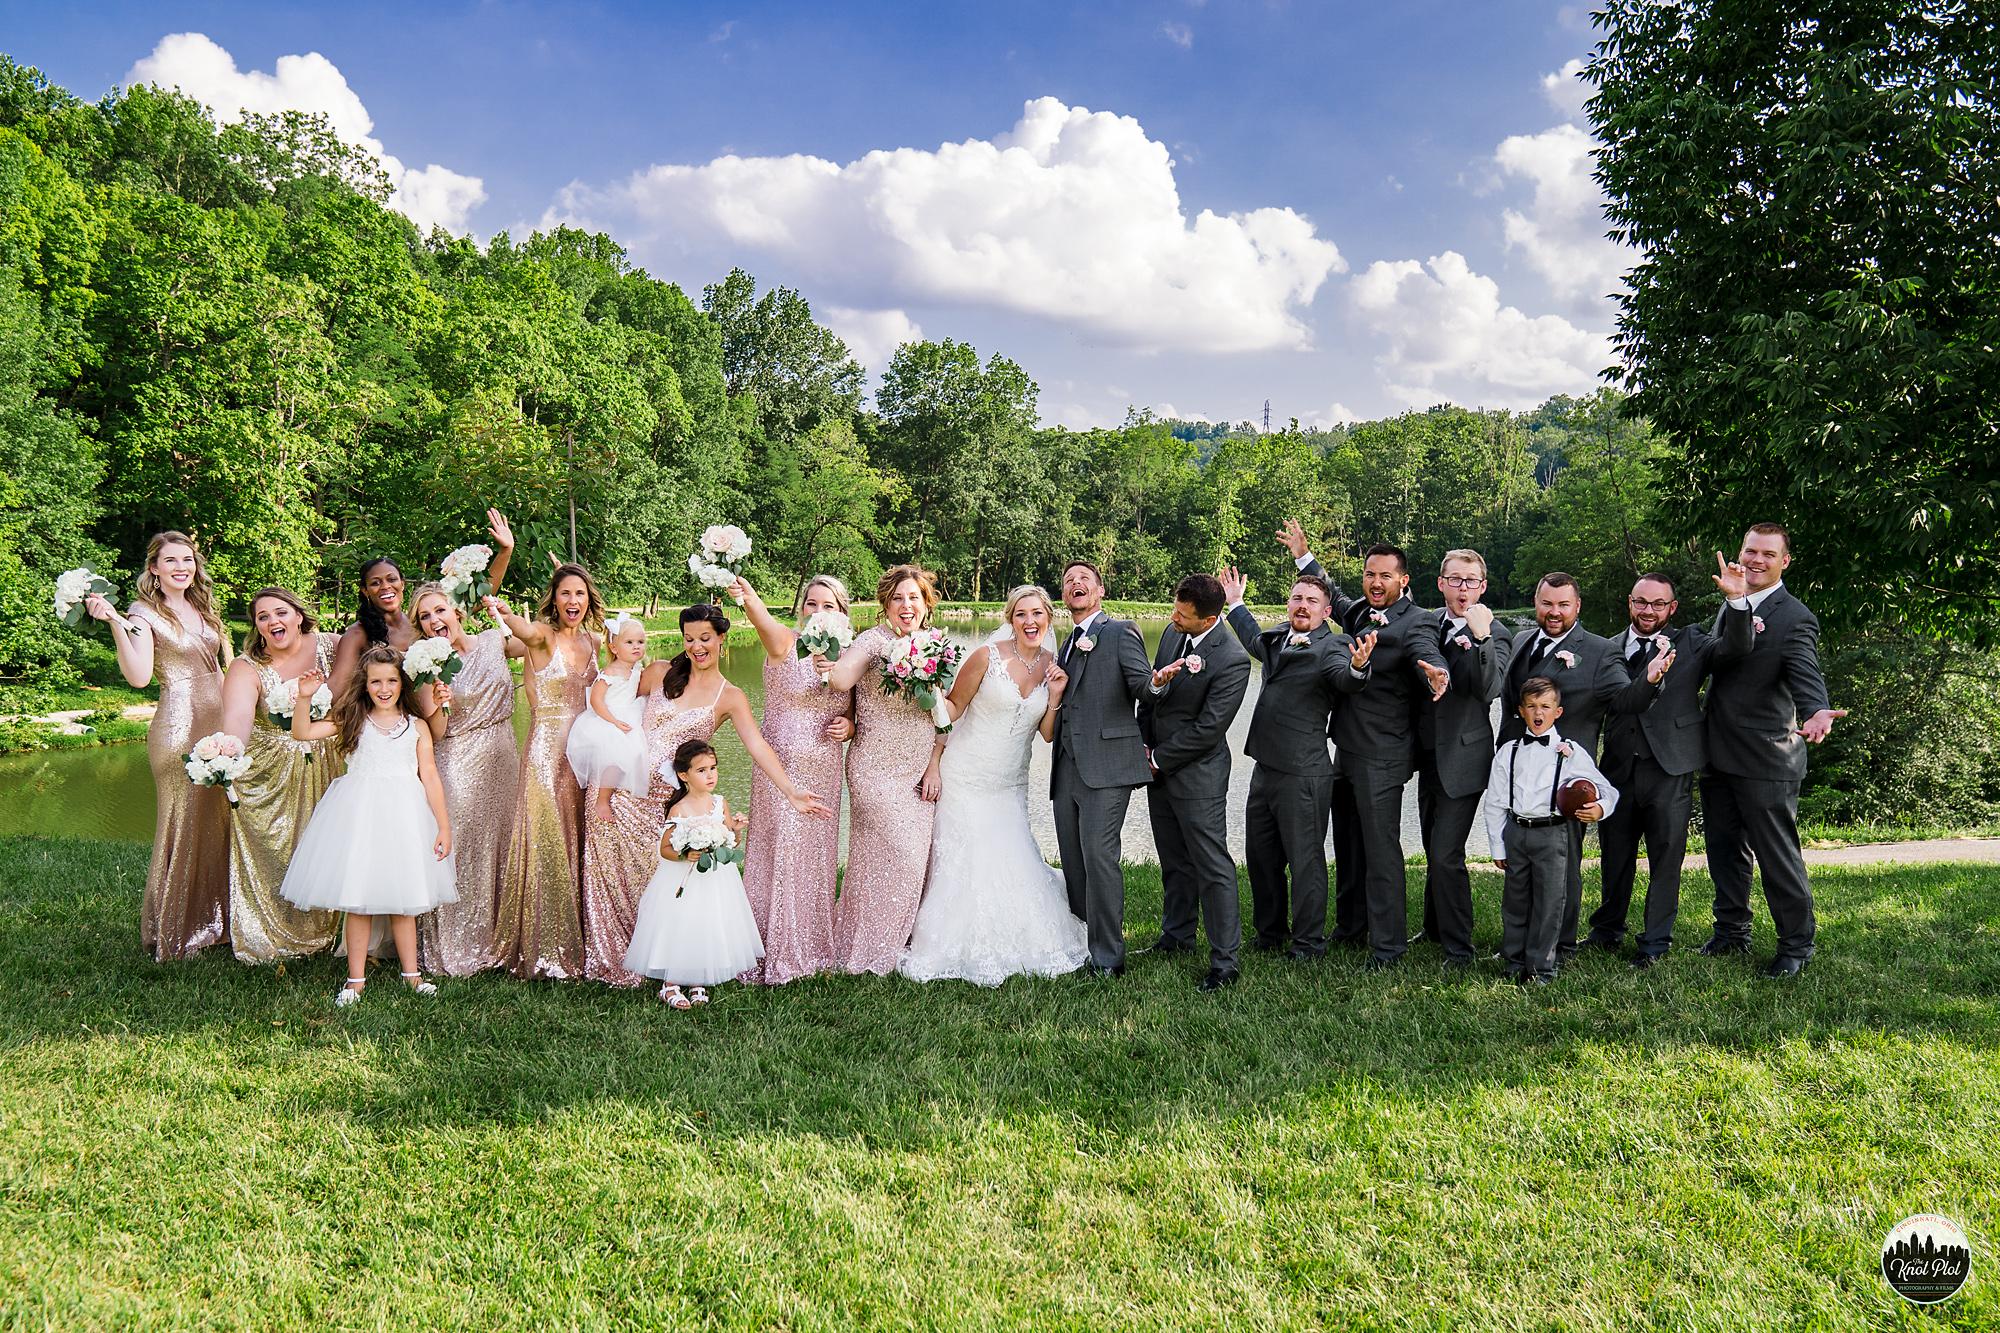 Southgate-Community-Center-KY-Wedding-Photography-15.jpg